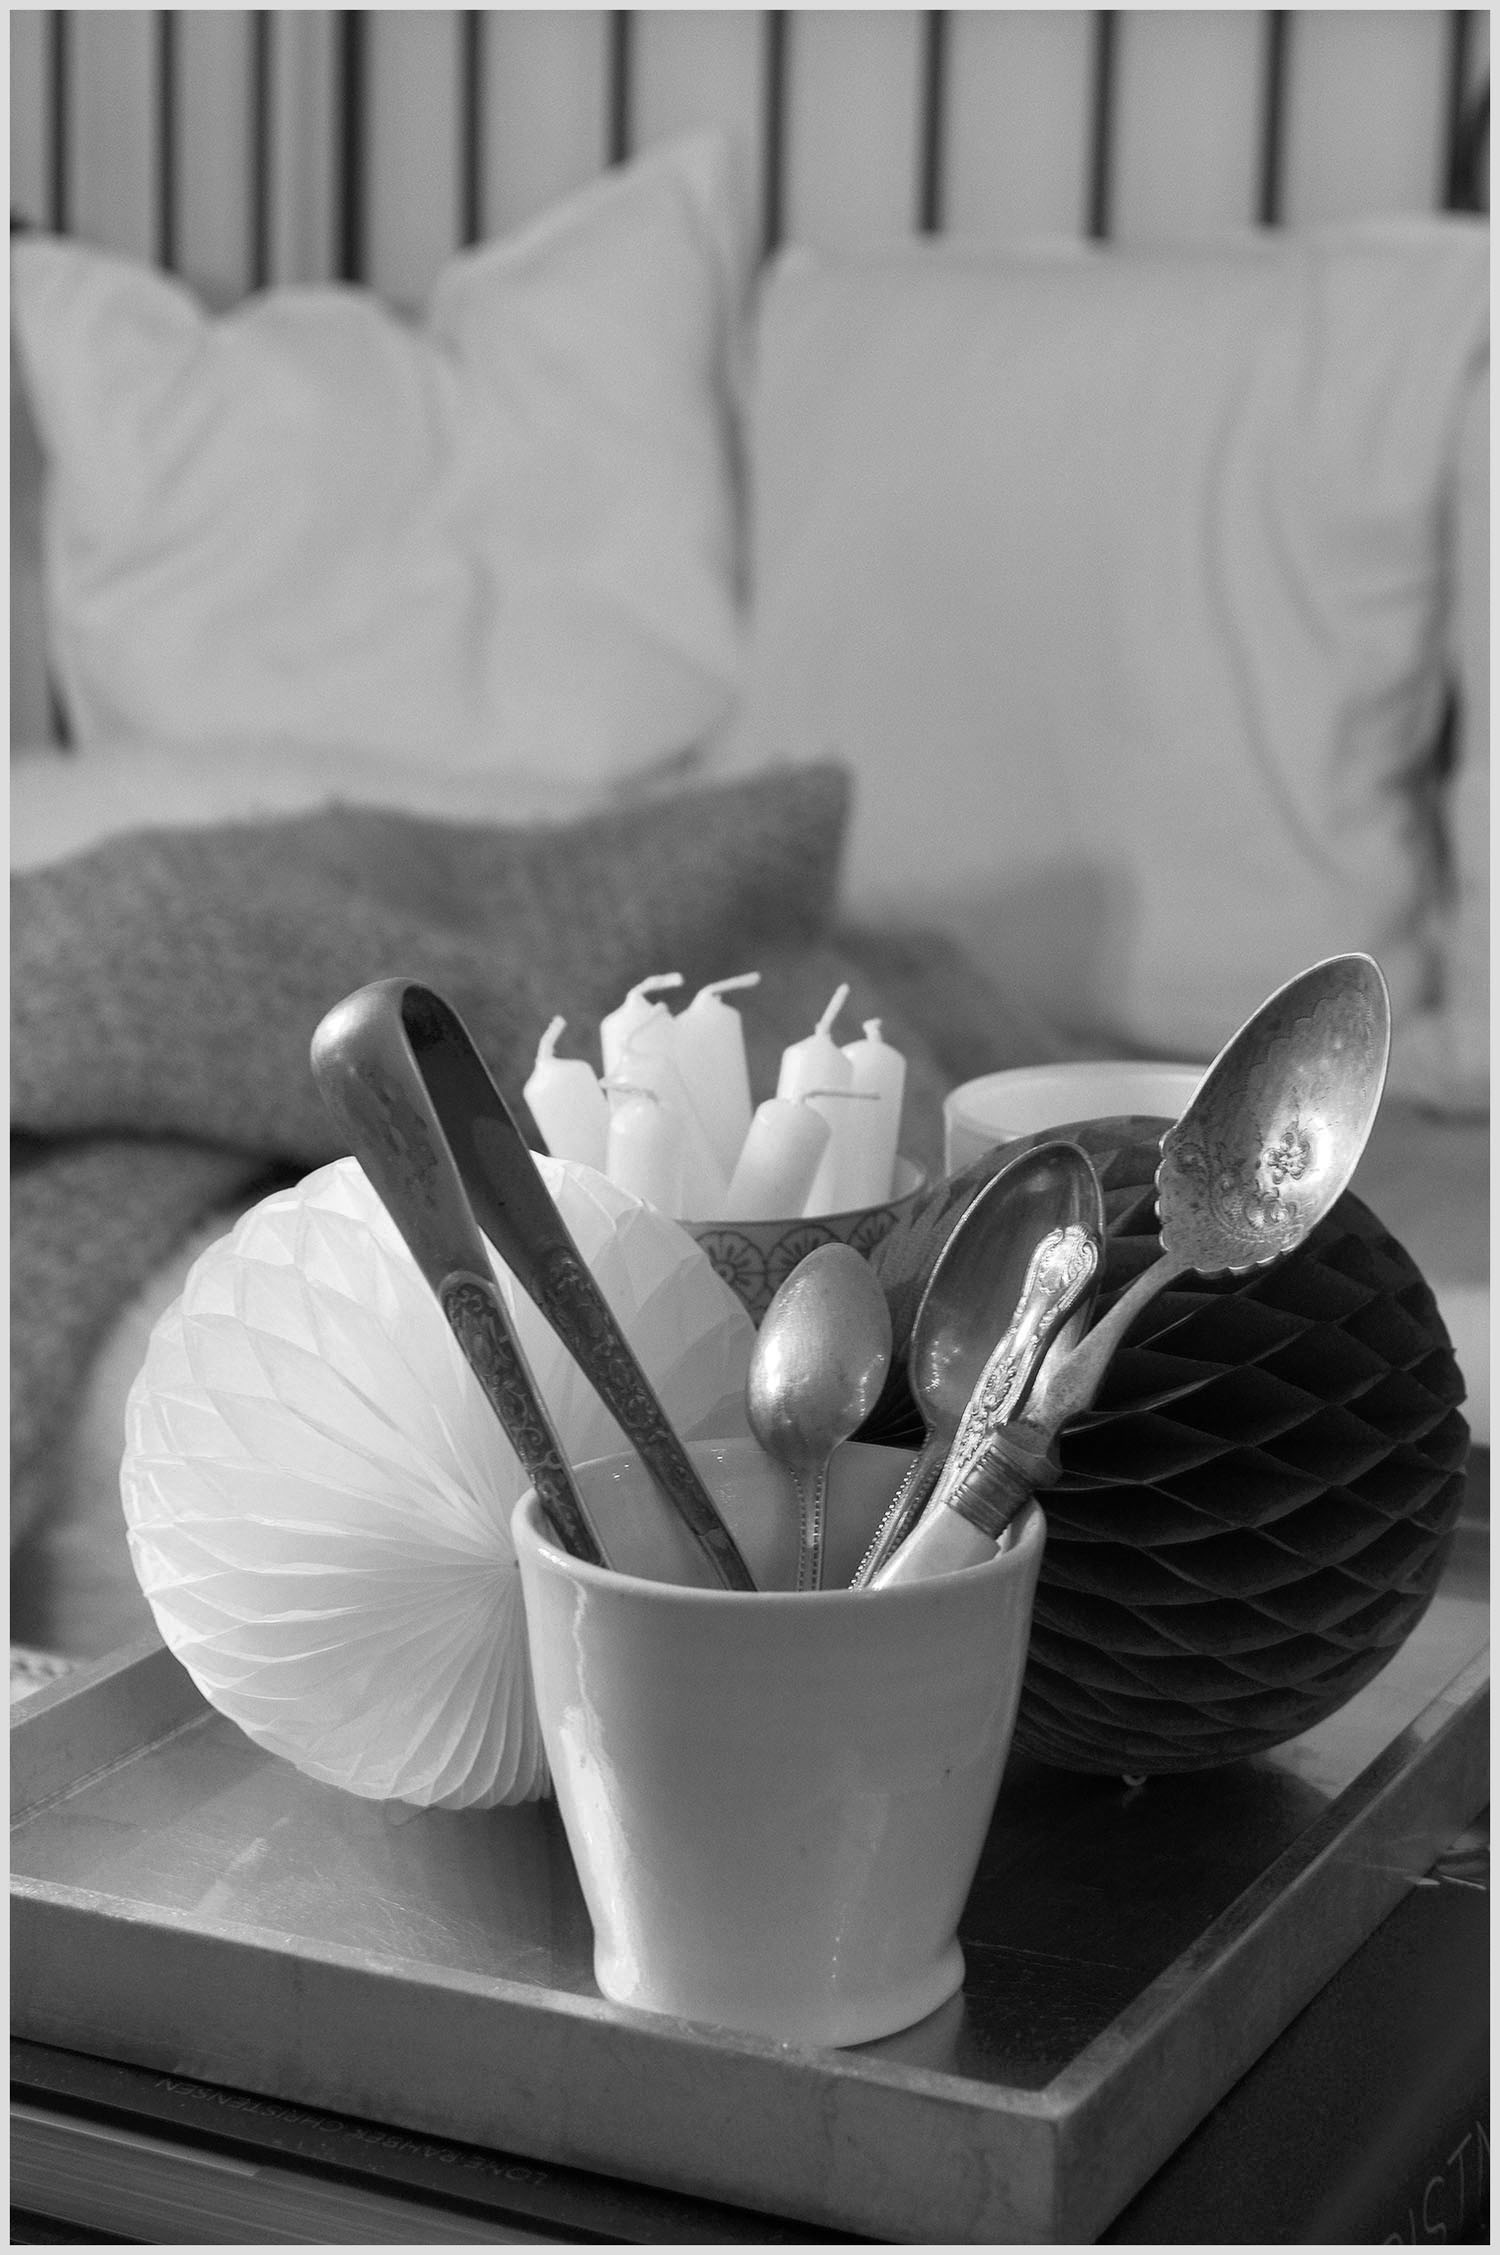 Winter Decorations Black & White